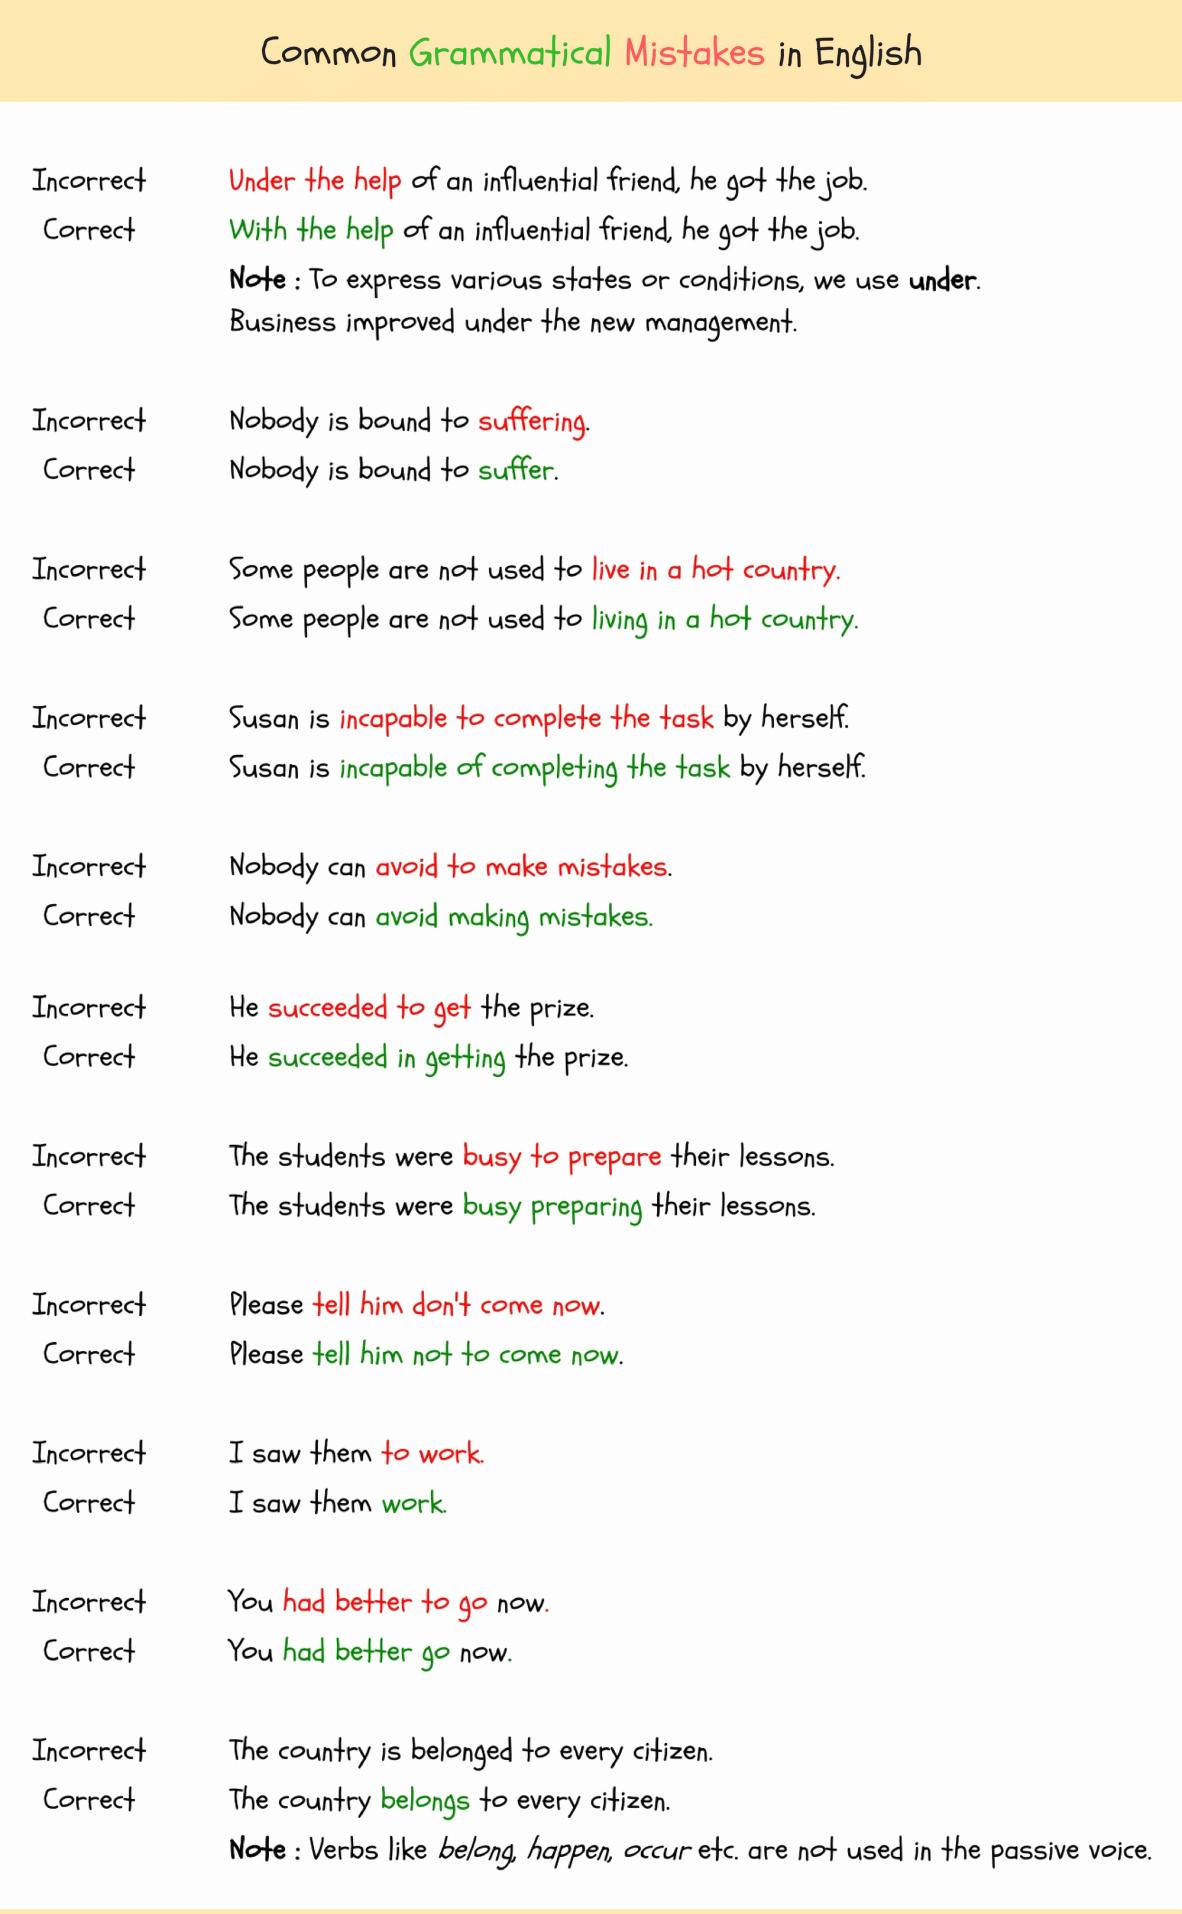 Grammatical Error Worksheets Best Of Grammatical Errors 150 Mon Grammatical Errors In